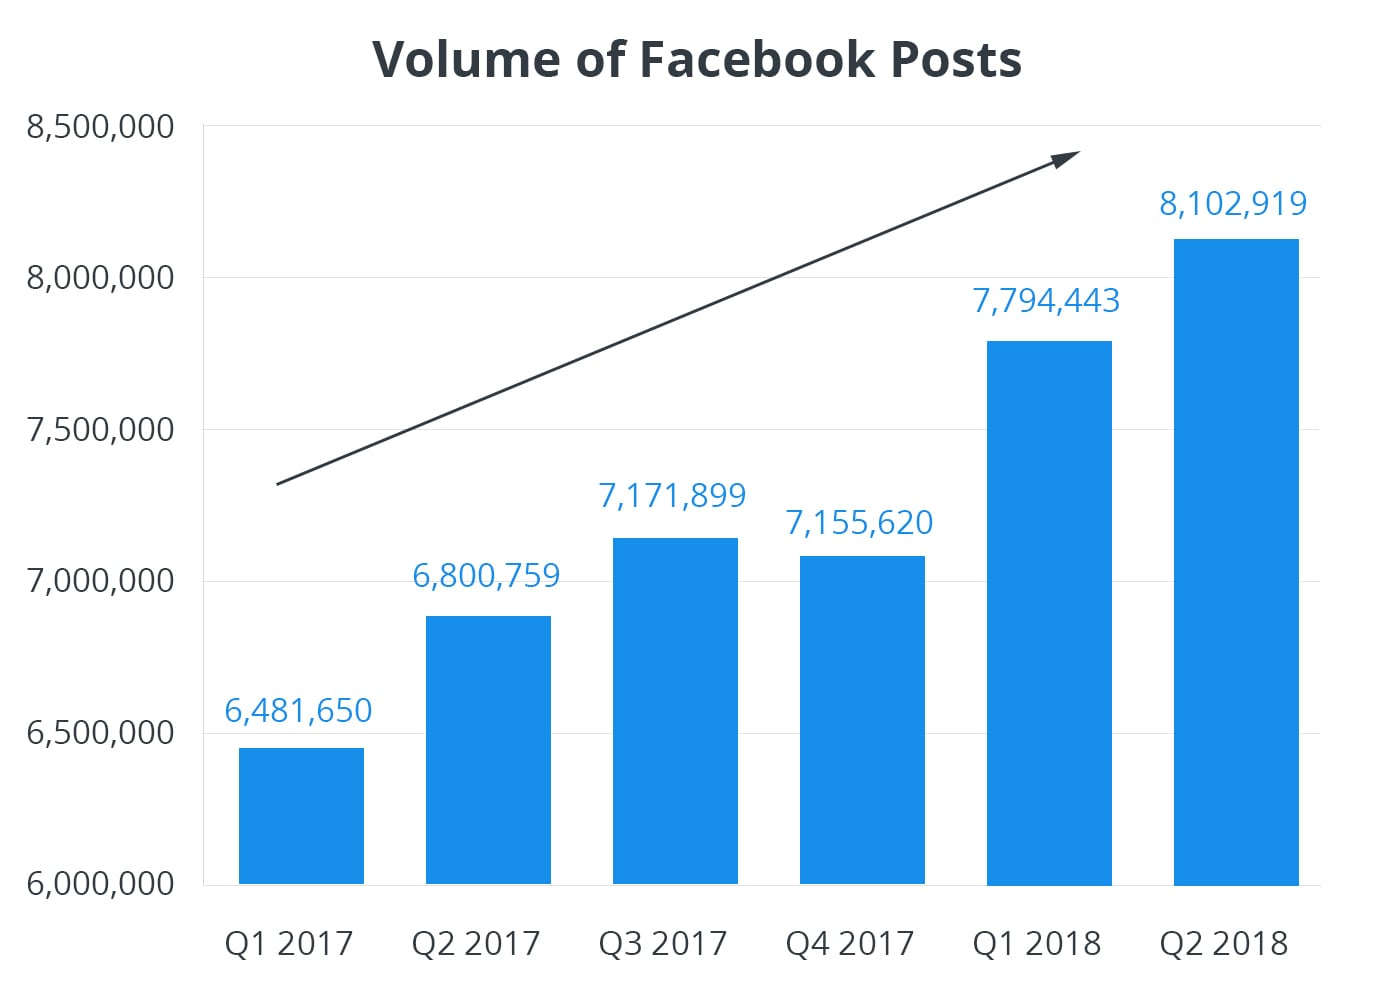 Volume-of-Facebook-Posts